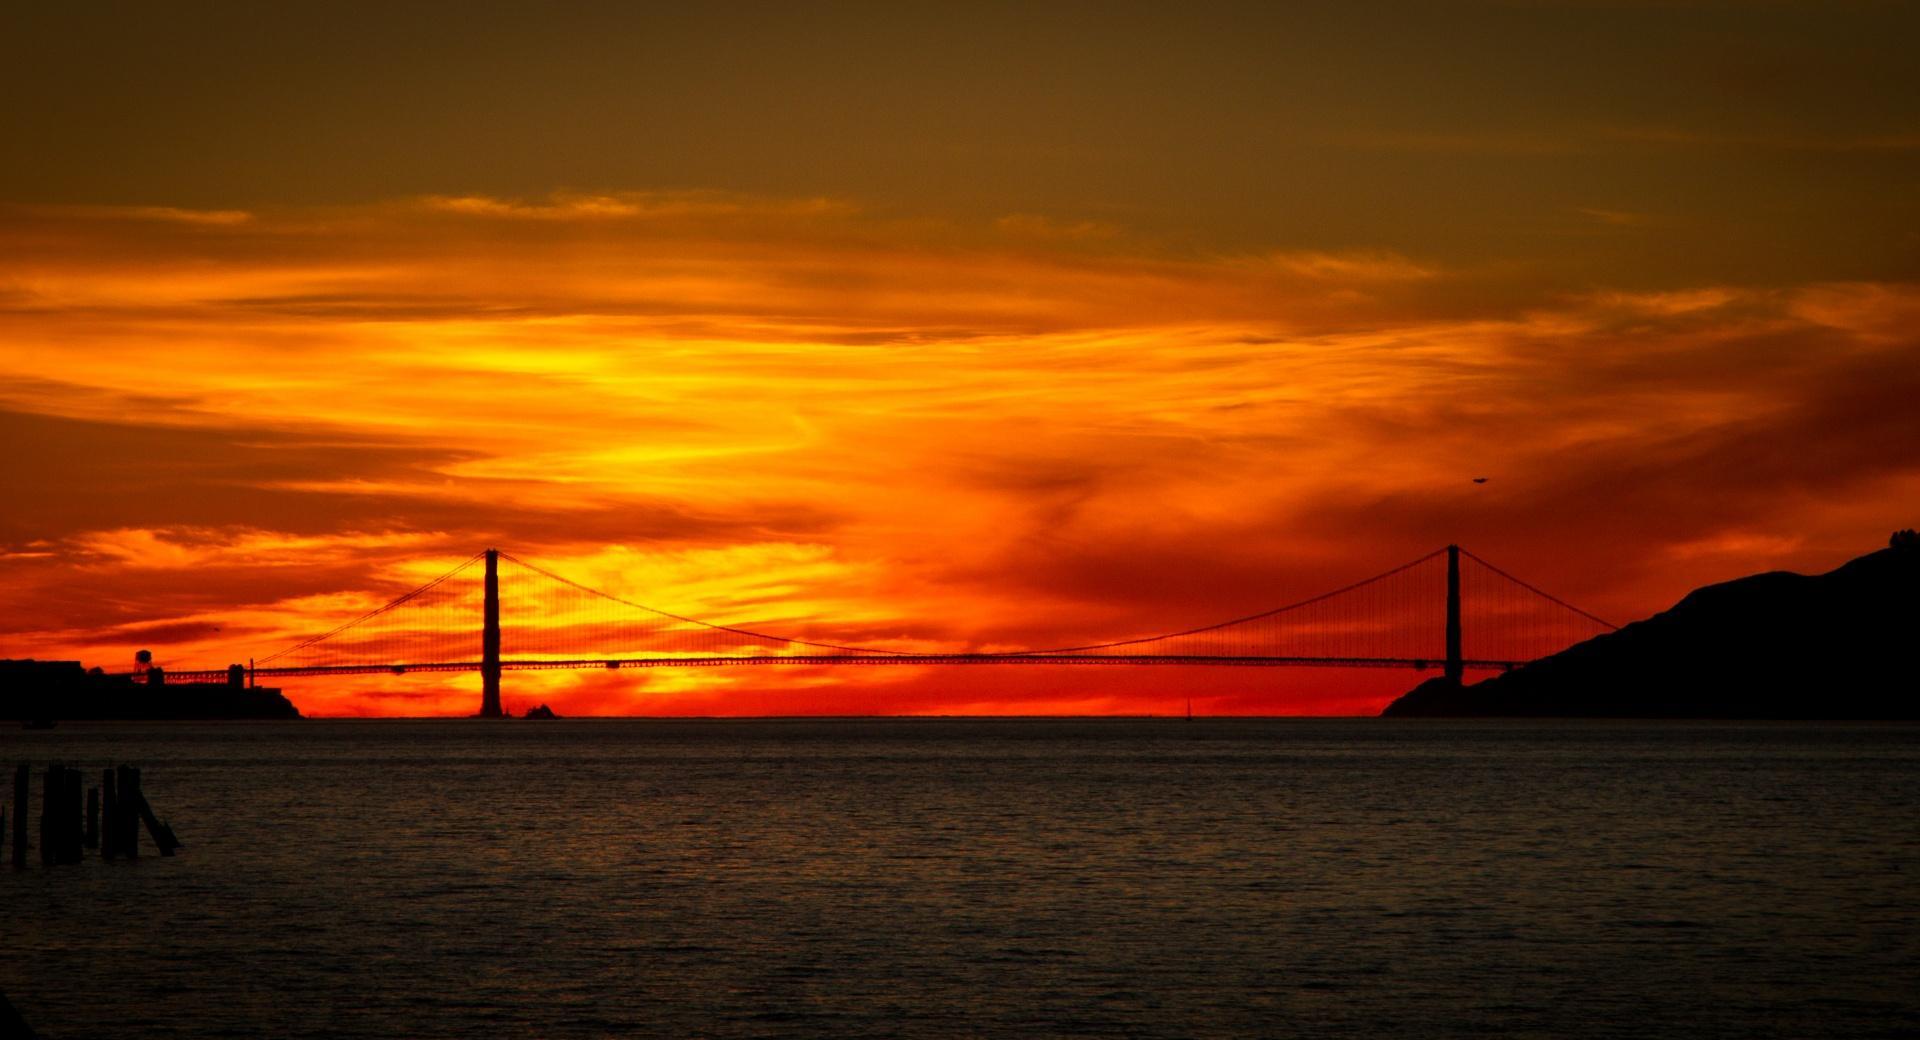 Red Sunrise Bridge wallpapers HD quality